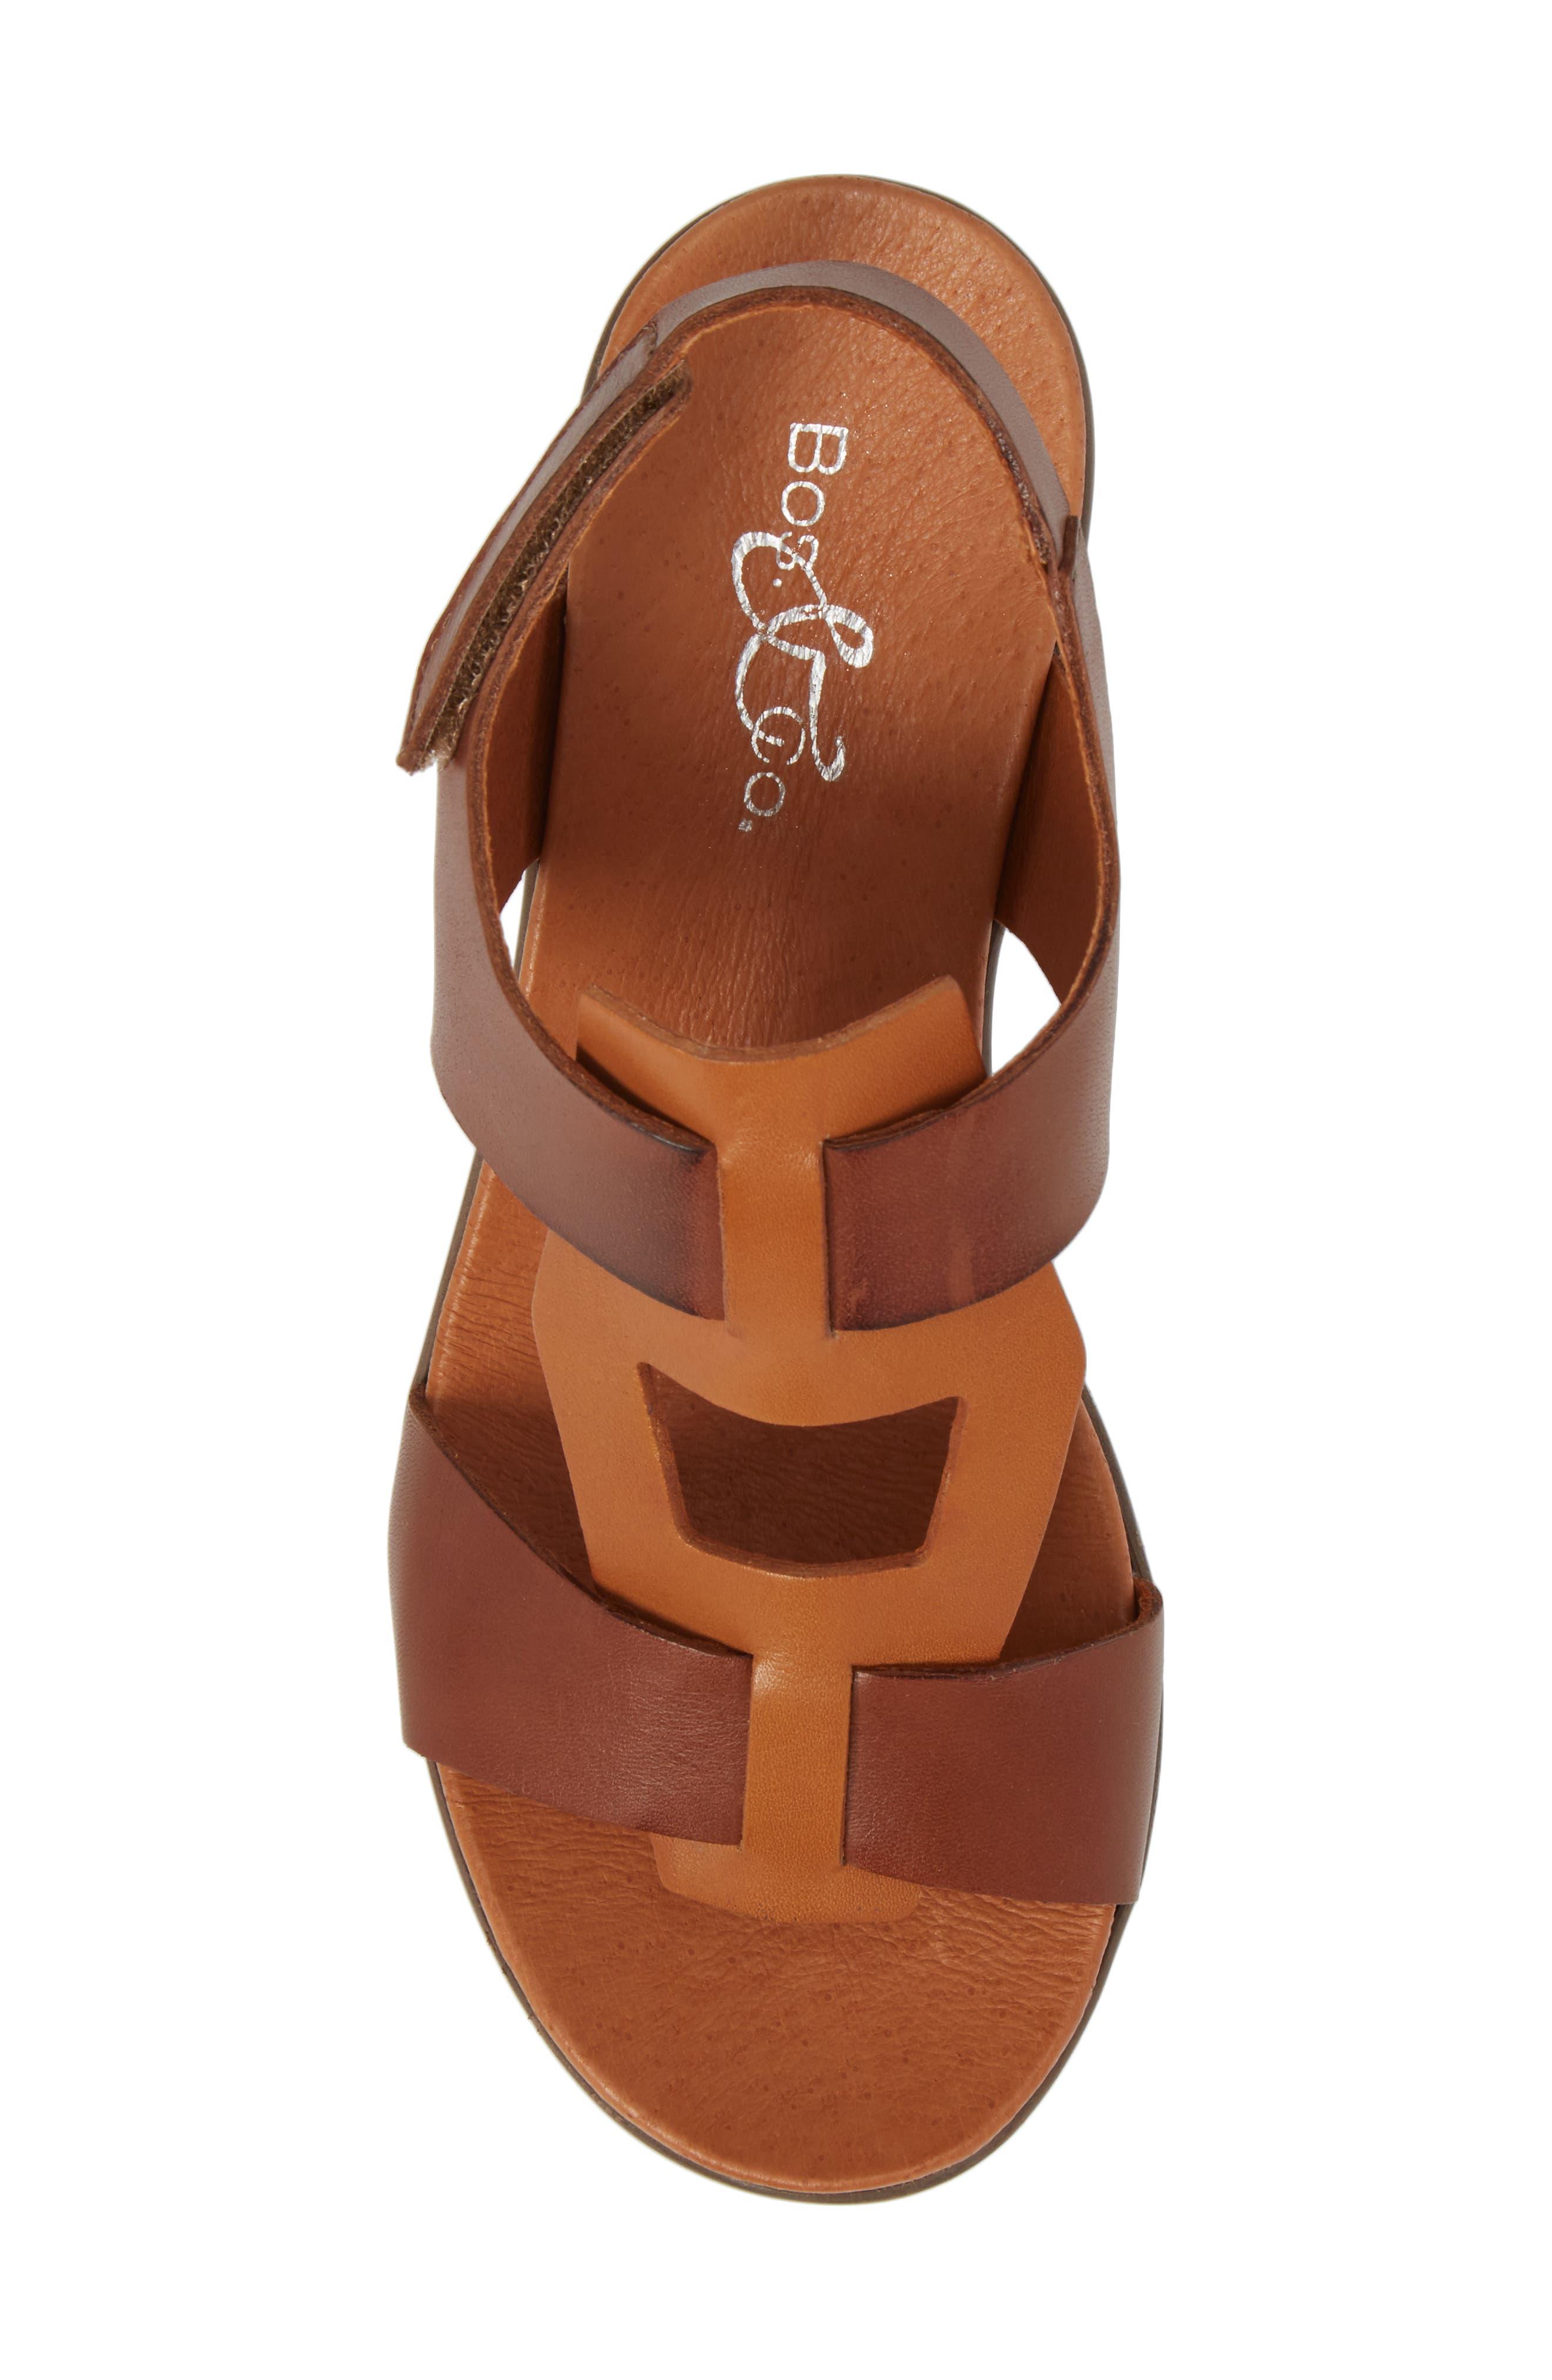 Somo Platform Wedge Sandal,                             Alternate thumbnail 5, color,                             Cognac/ Camel Leather